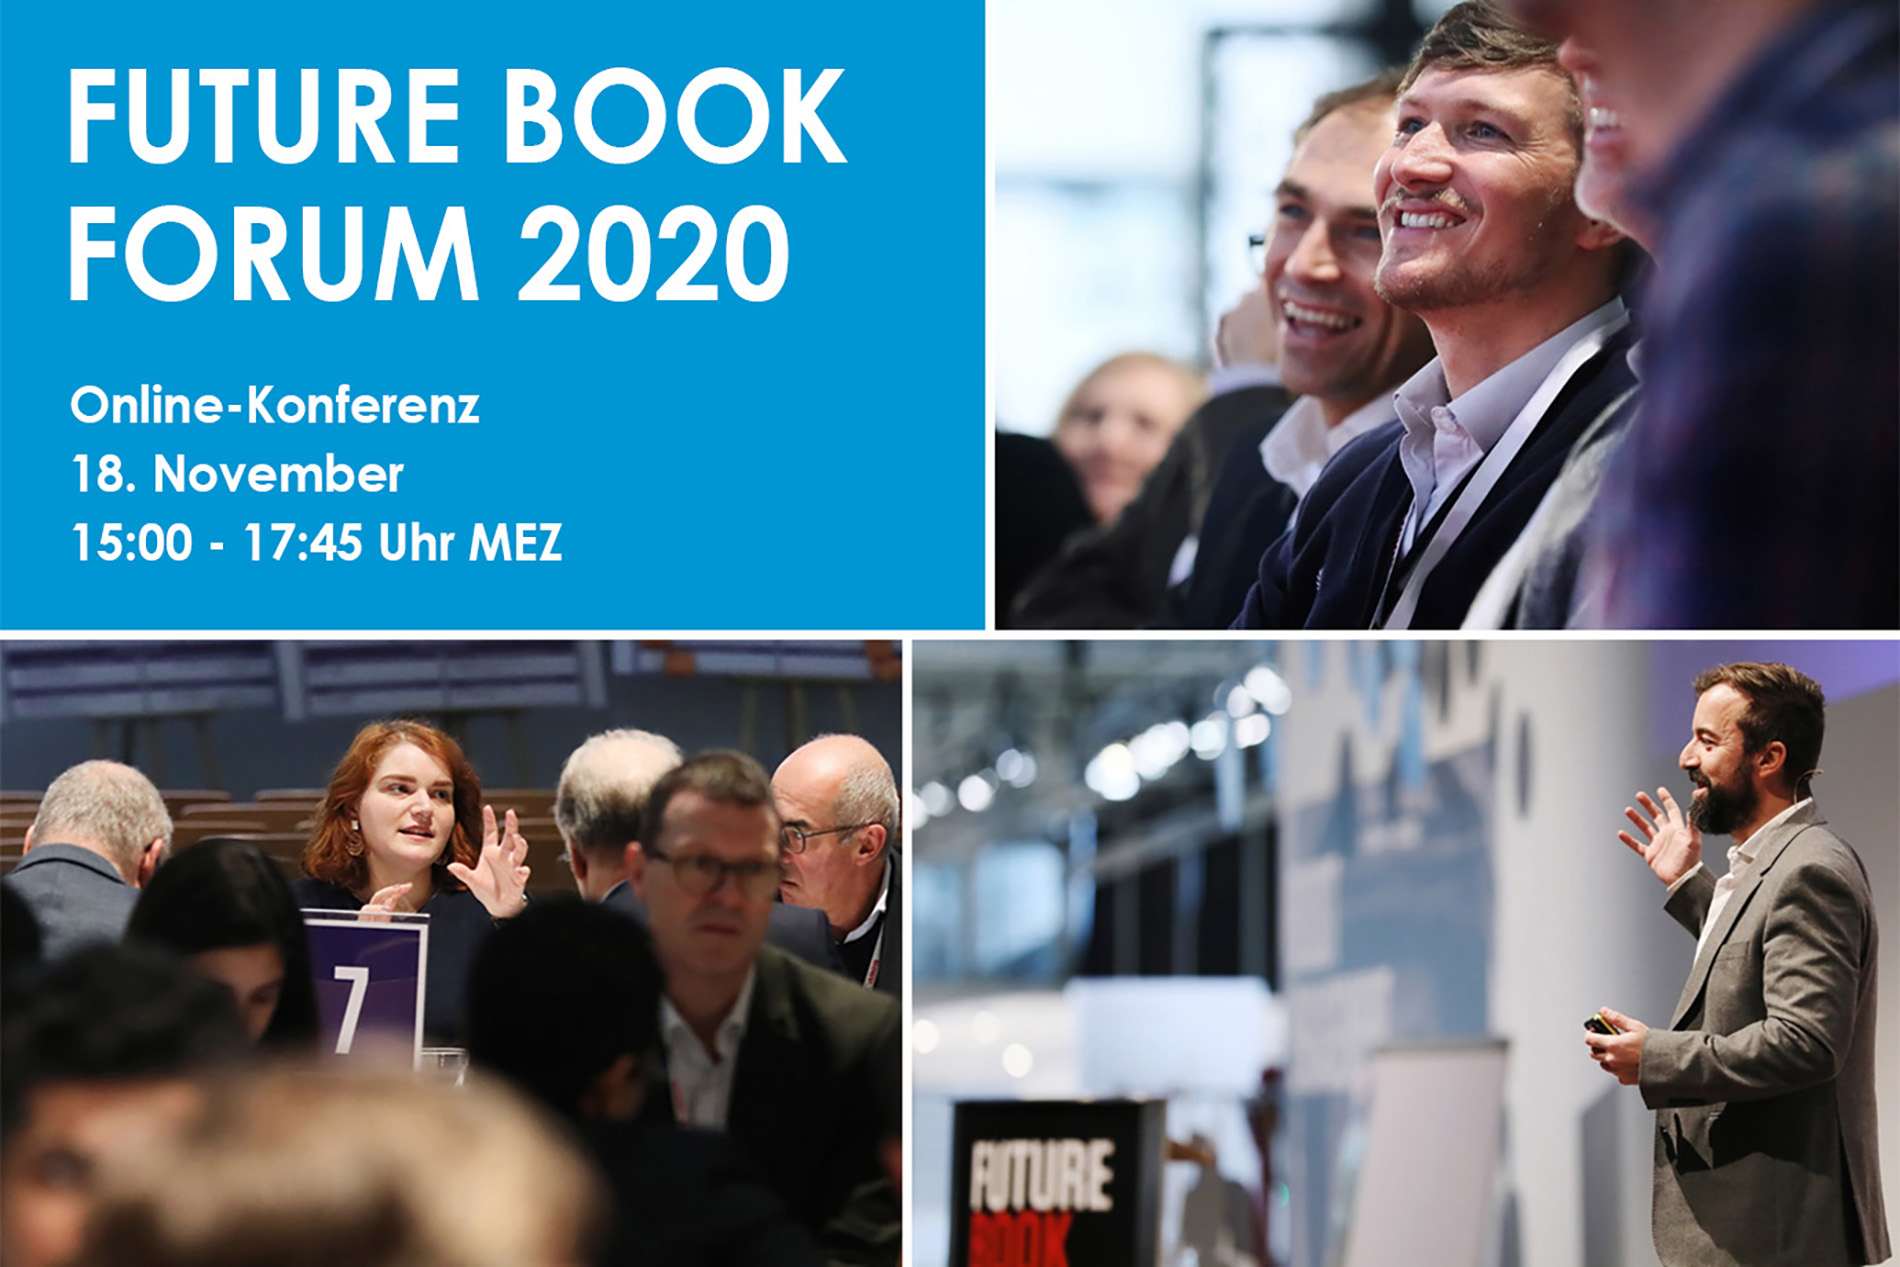 Future Book Forum 2020 - 18. November 2020